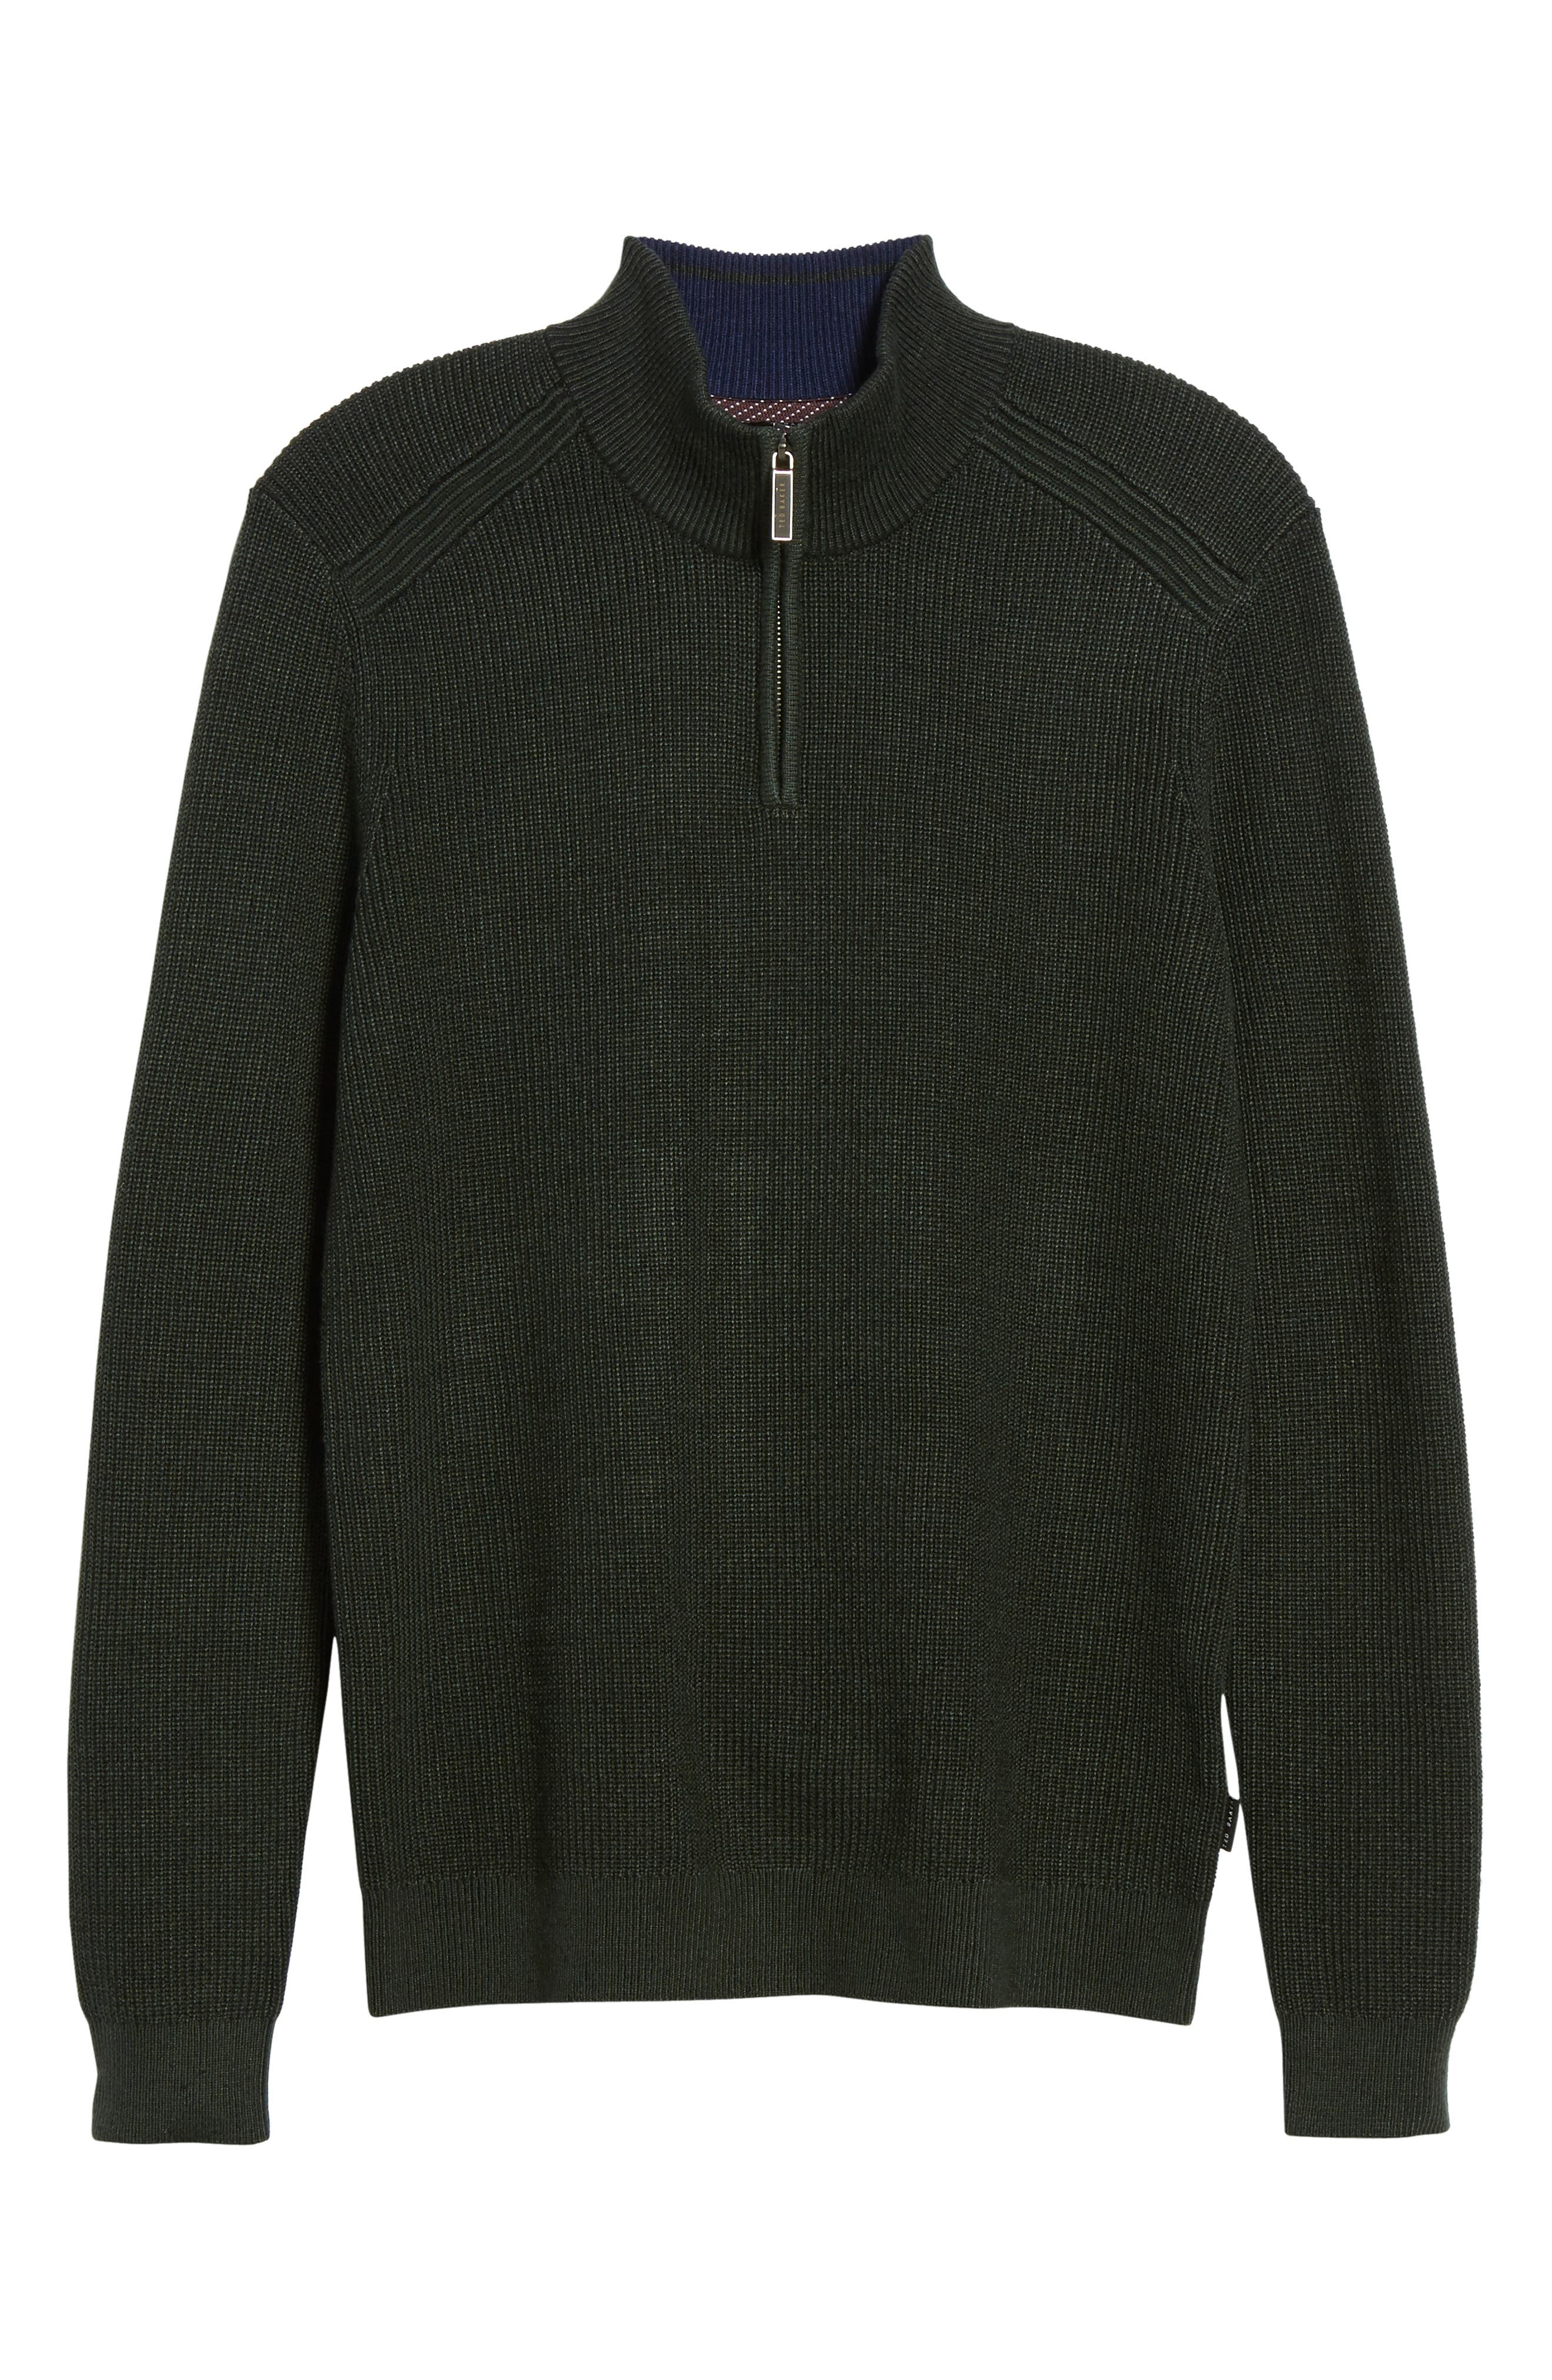 Alternate Image 1 Selected - Ted Baker London Stach Quarter Zip Sweater